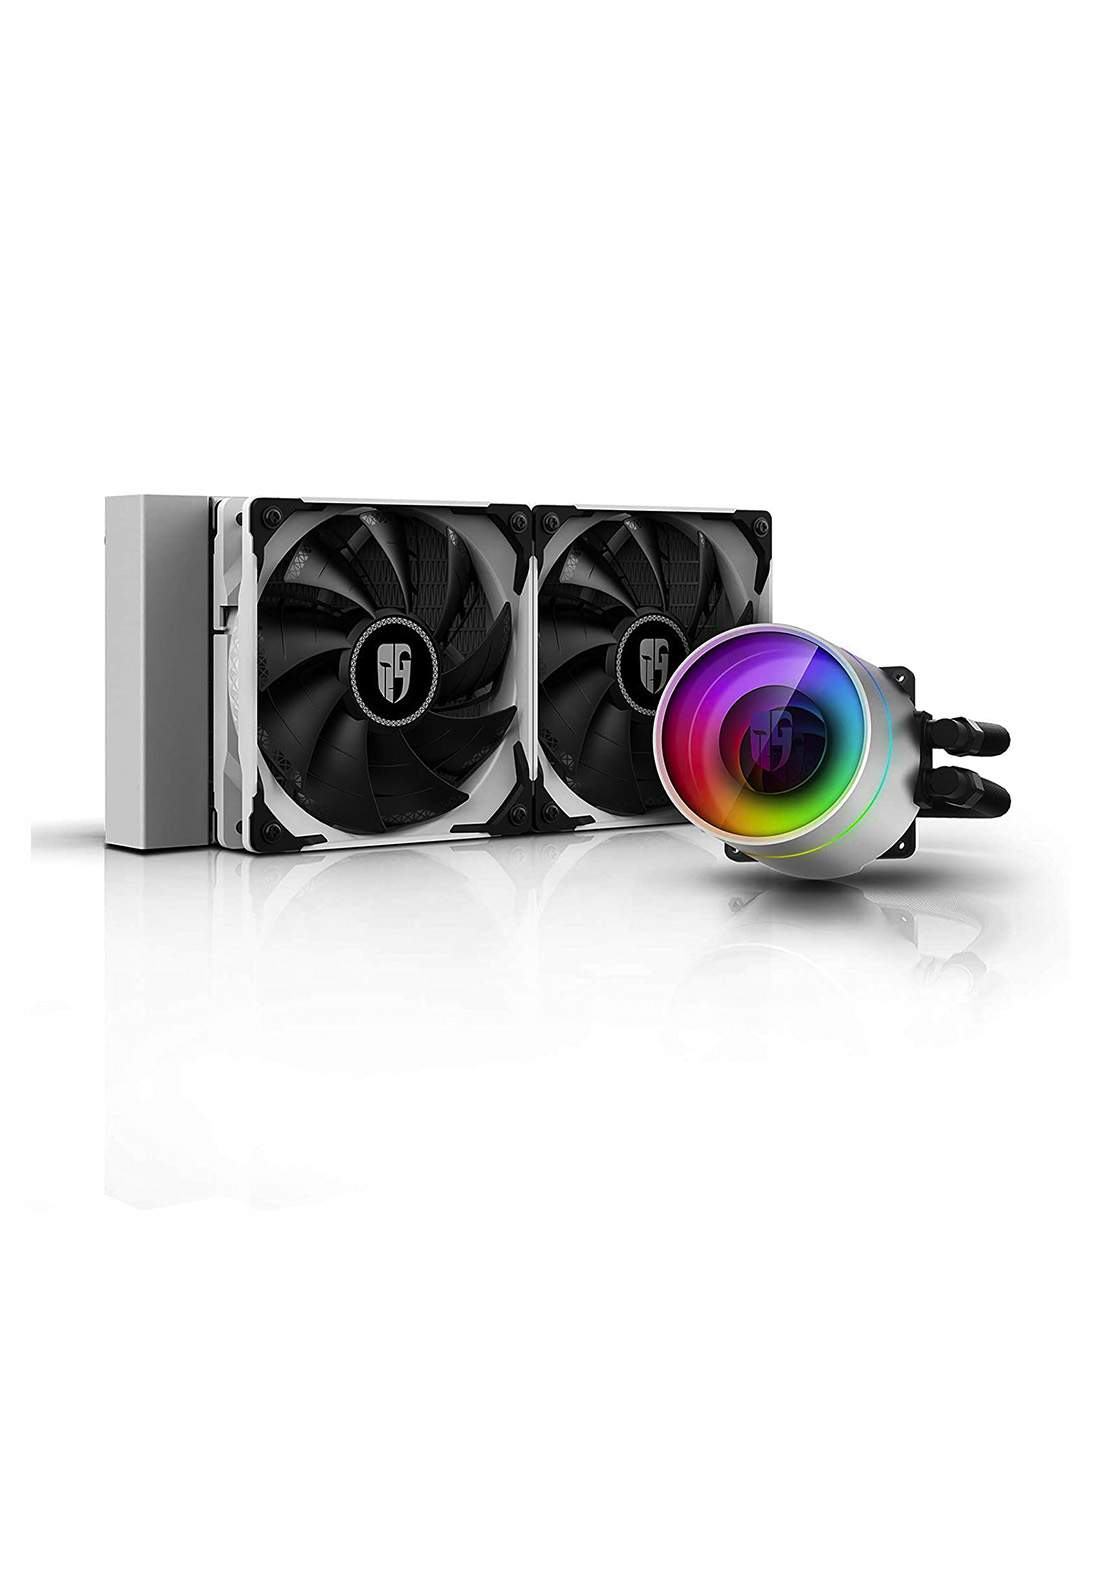 DeepCool Castle 240EX Addressable RGB AIO Liquid CPU Cooler - White مبرد معالج